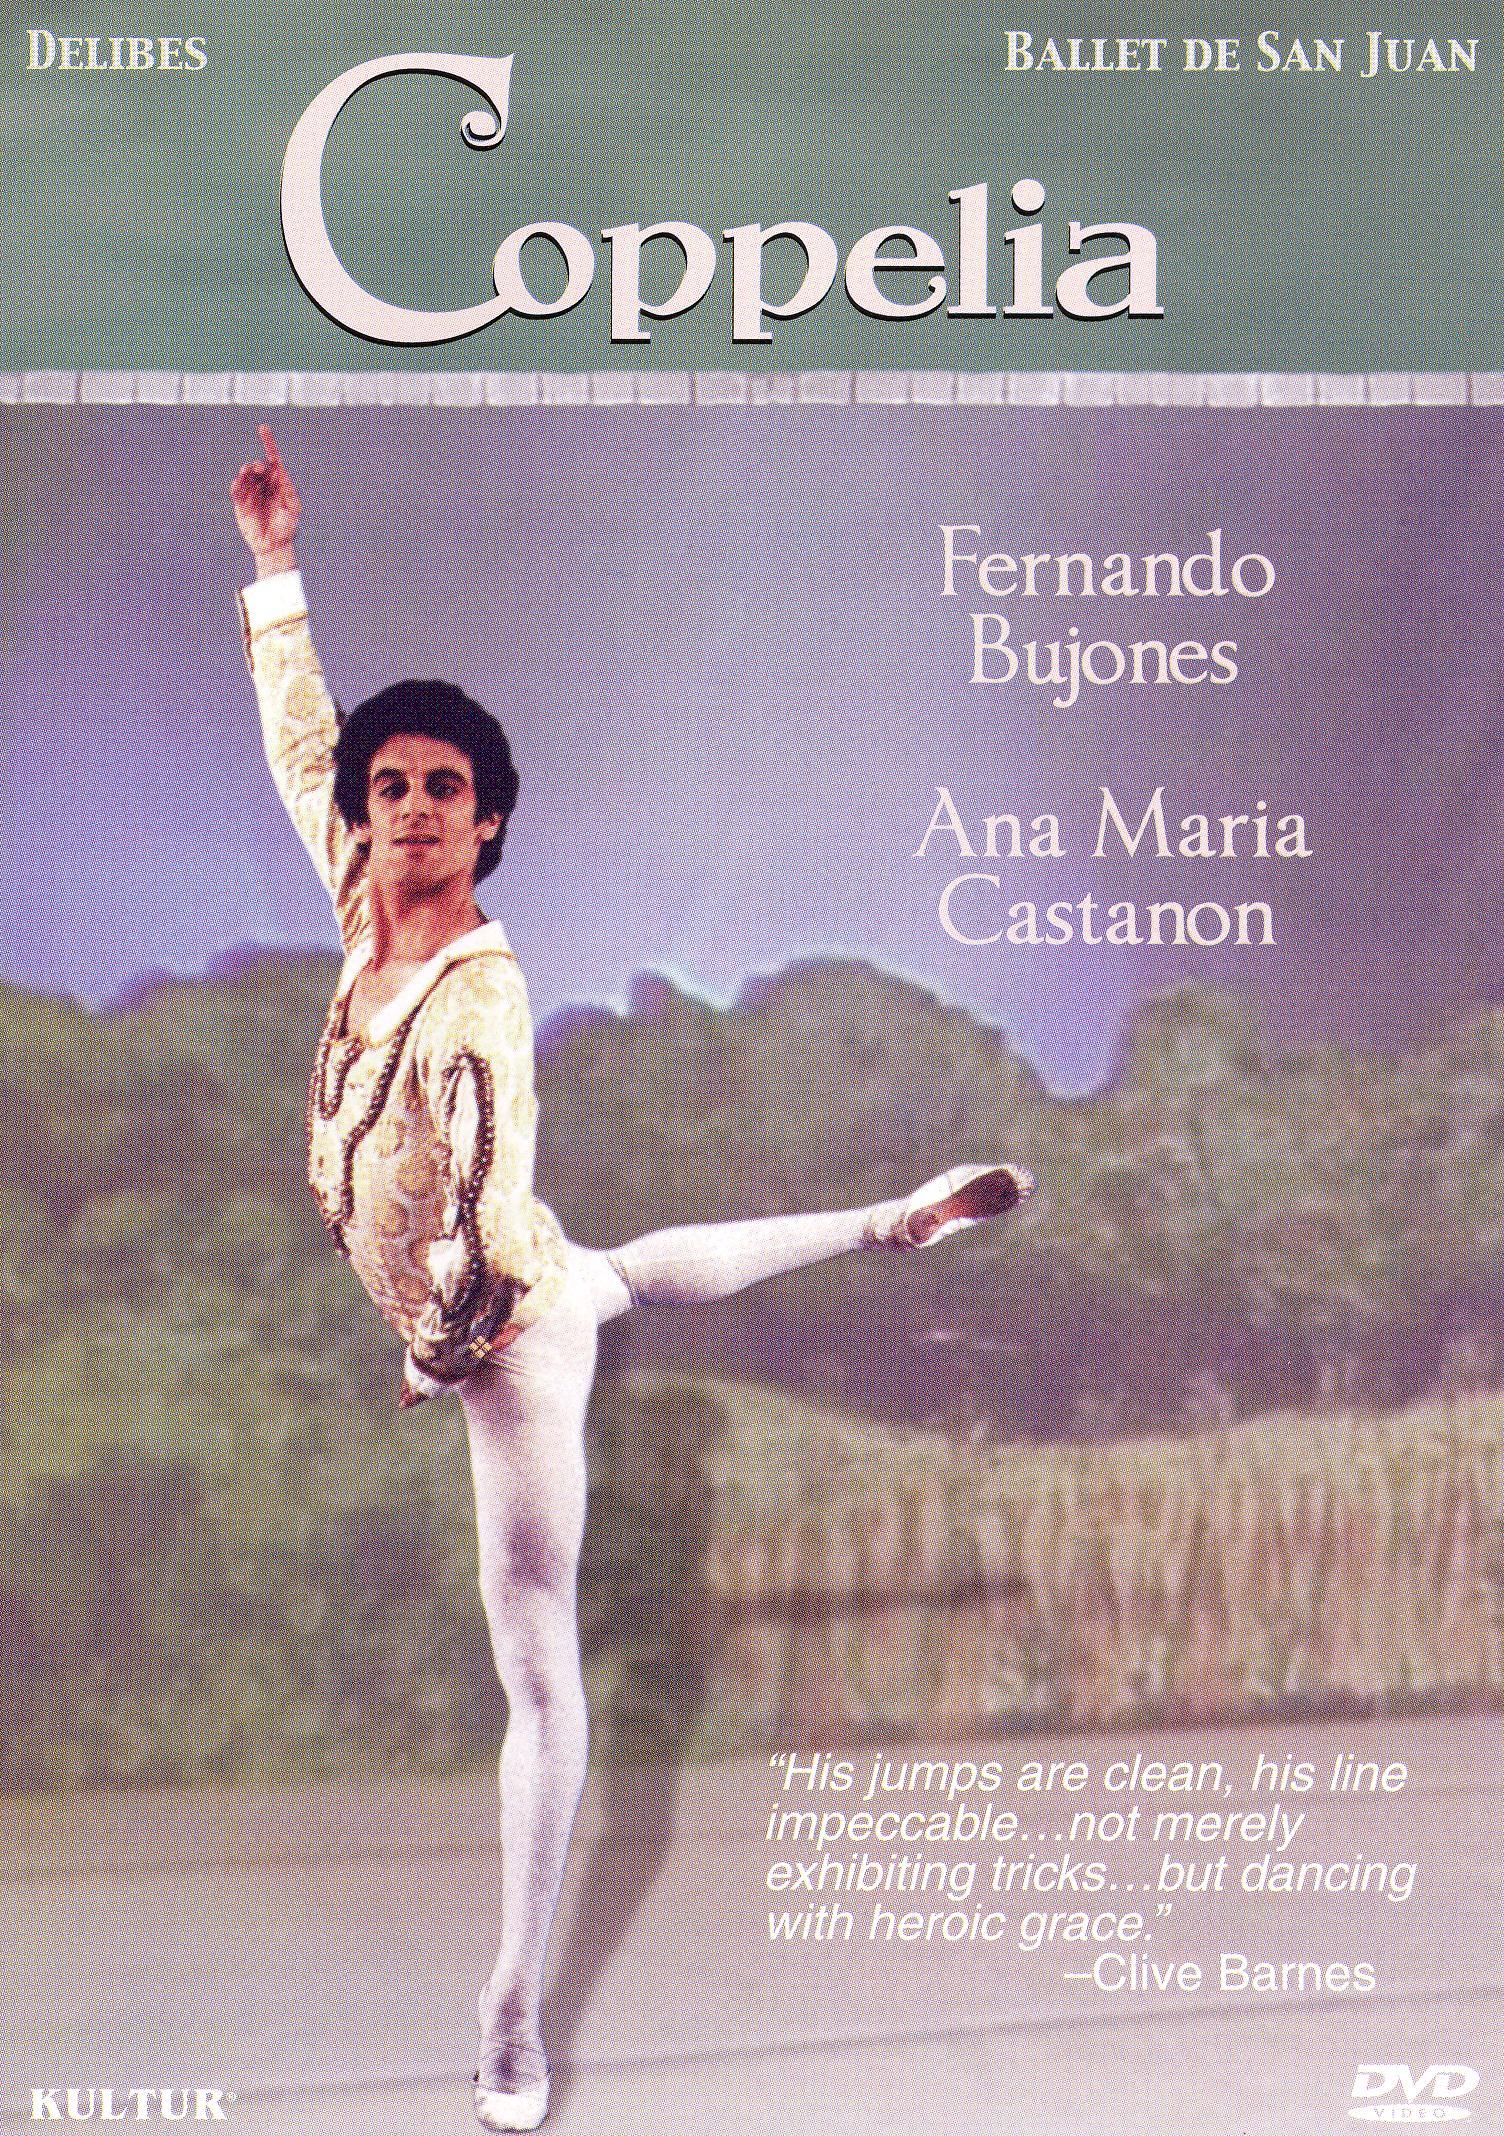 Coppelia (Ballet de San Juan)